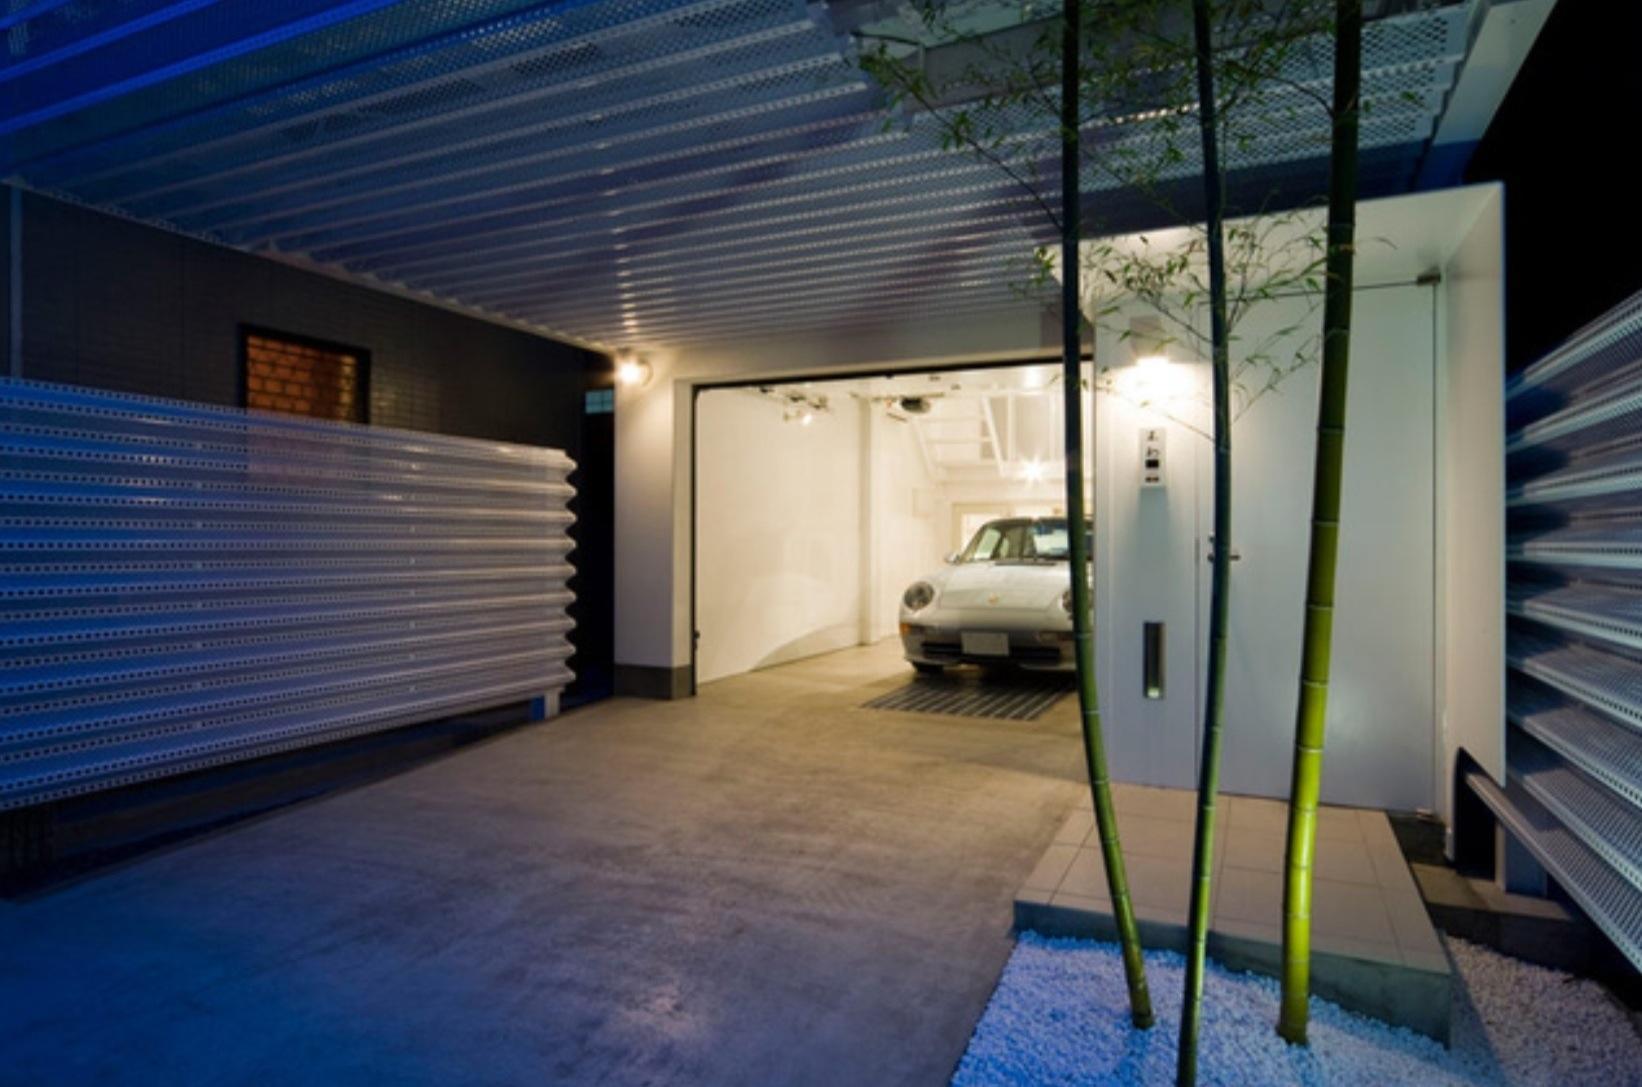 El garaje m s elegante jam s dise ado paperblog - Diseno de garajes ...